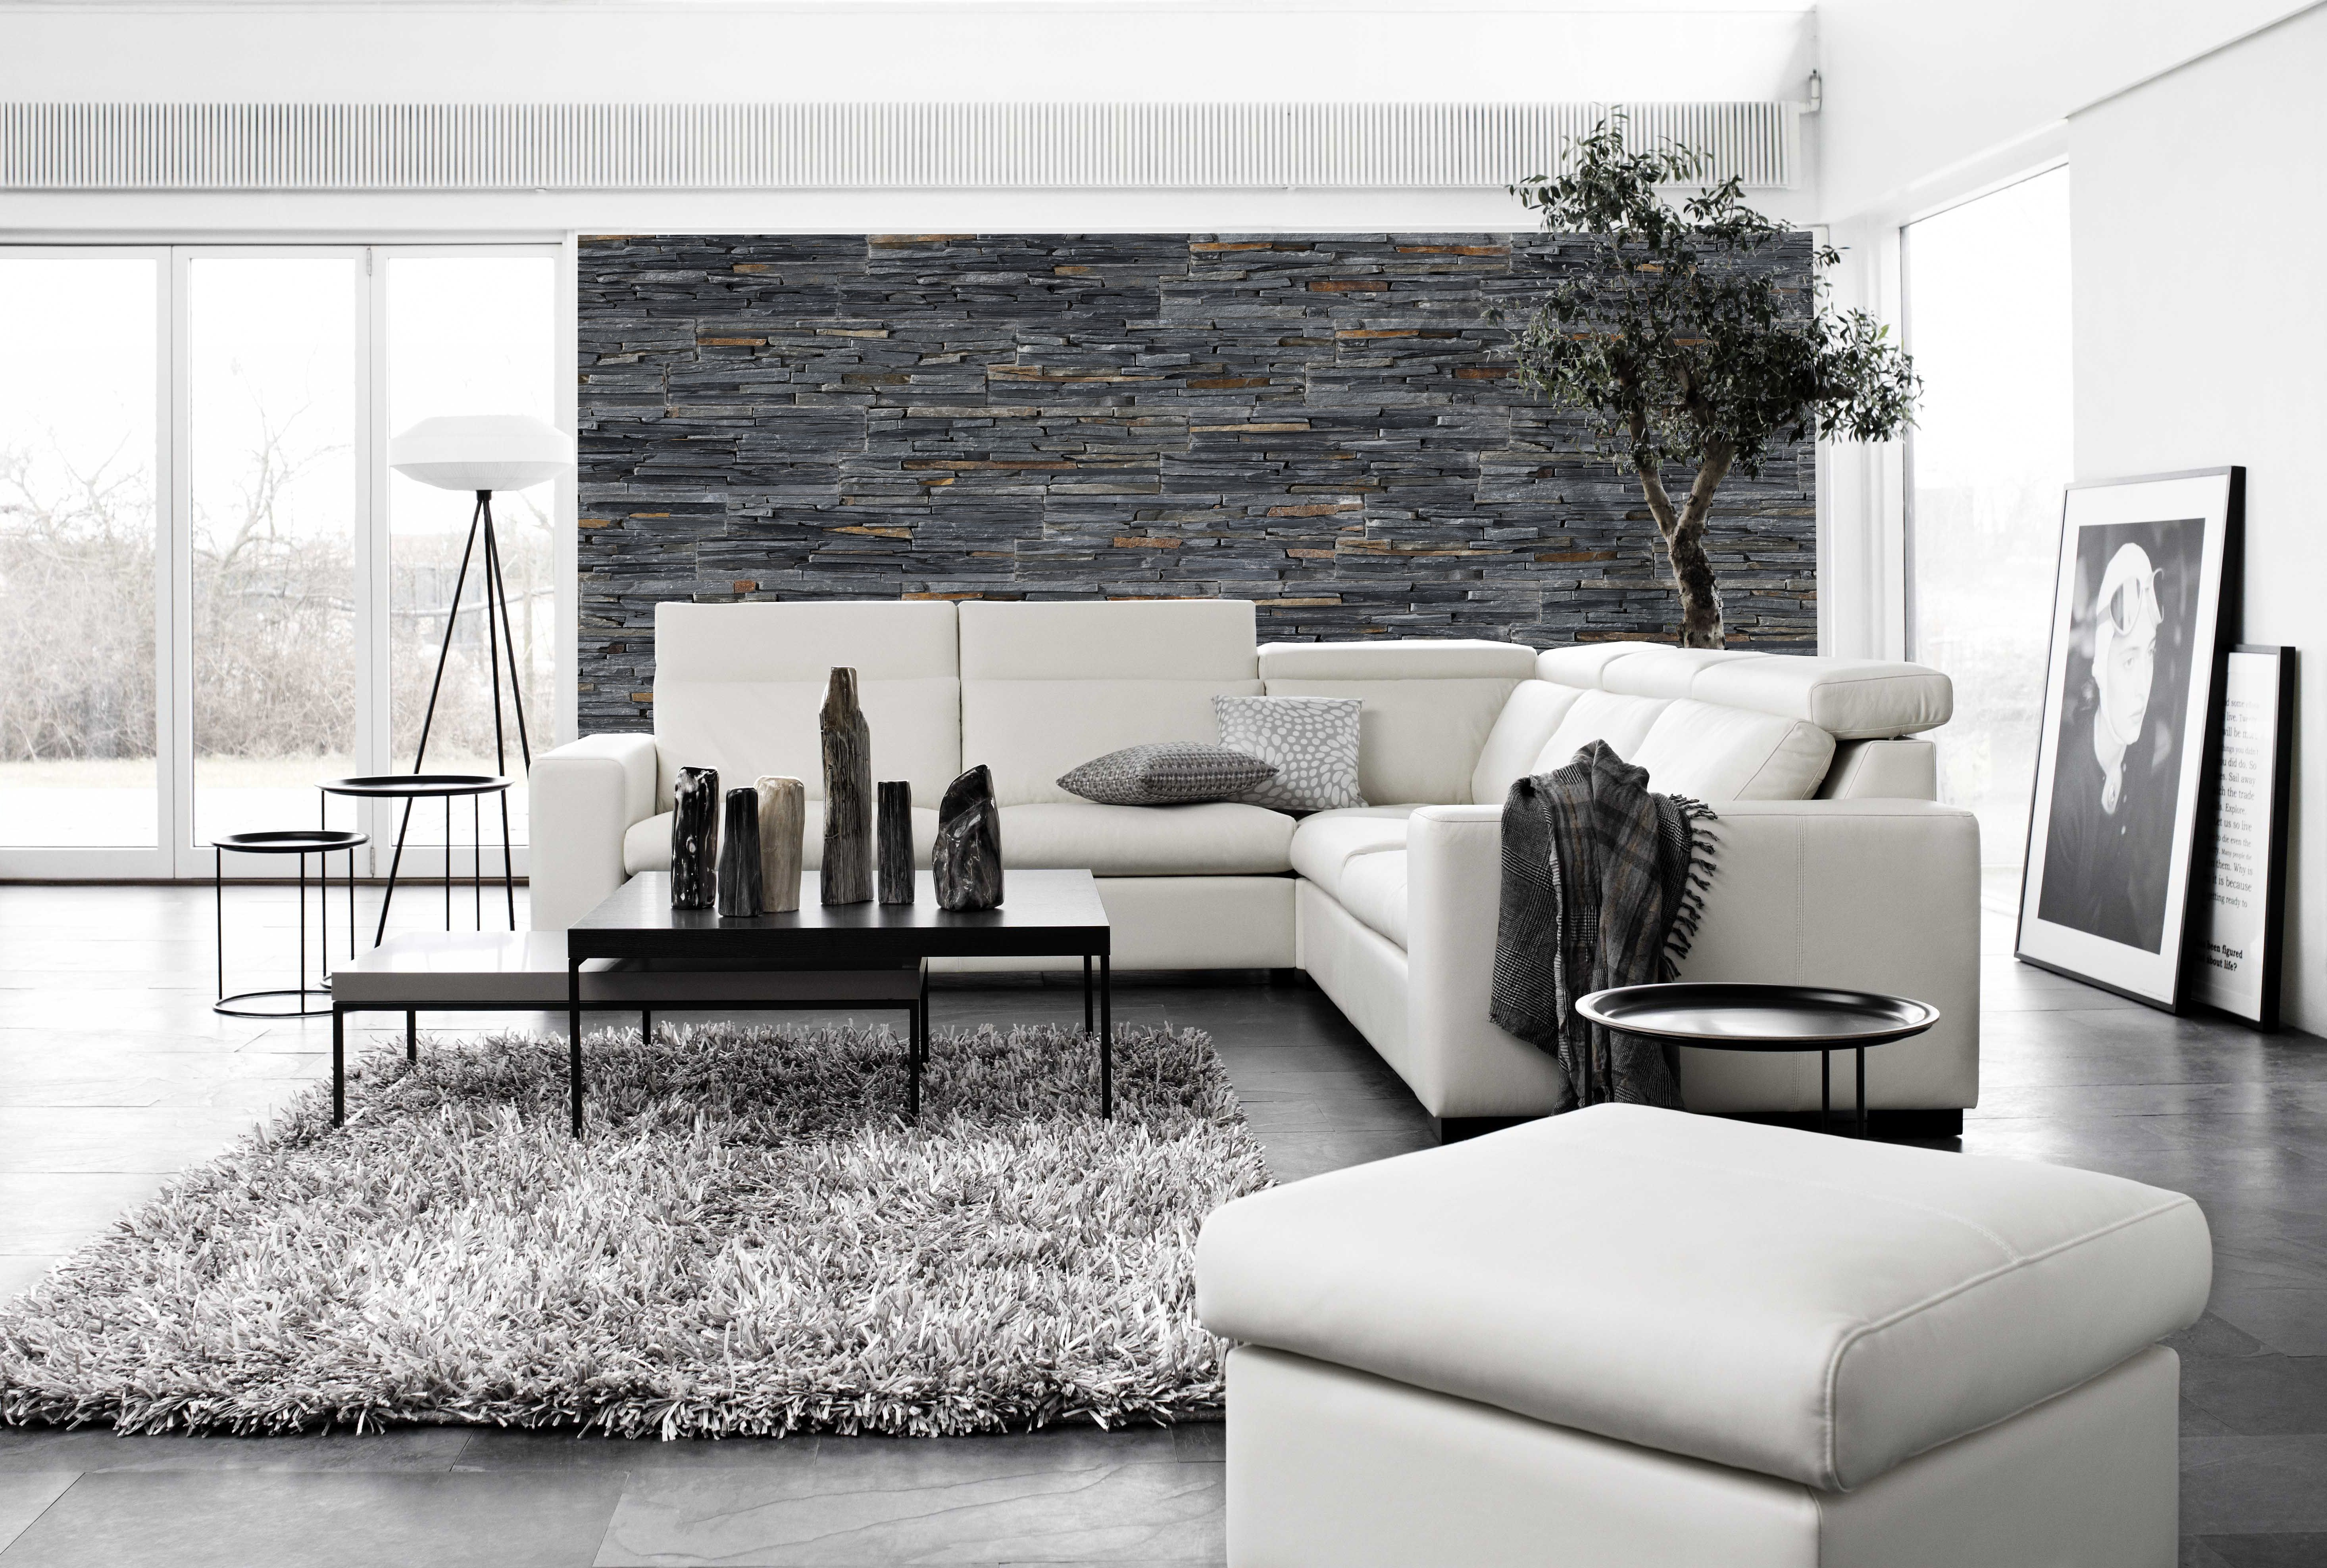 Stonepanel laja negra paneles de piedra natural para la decoraci n de tu hogar stonepanel - Paneles de piedra natural ...